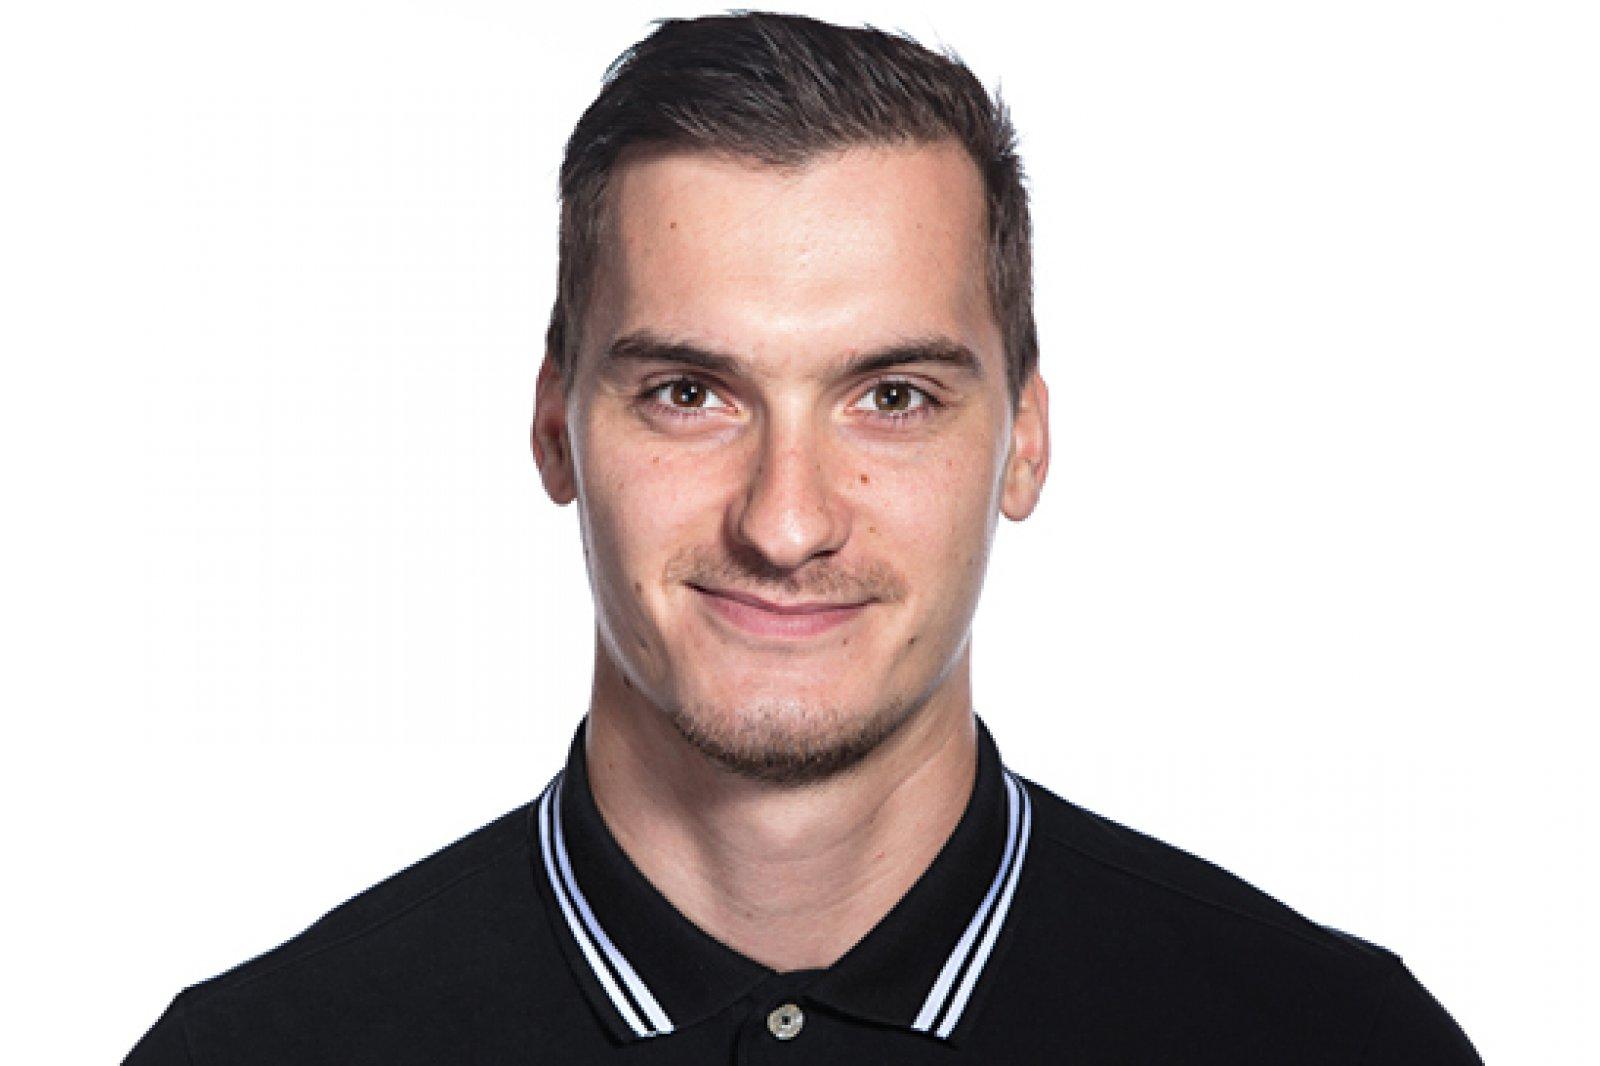 Tomáš Harkabus